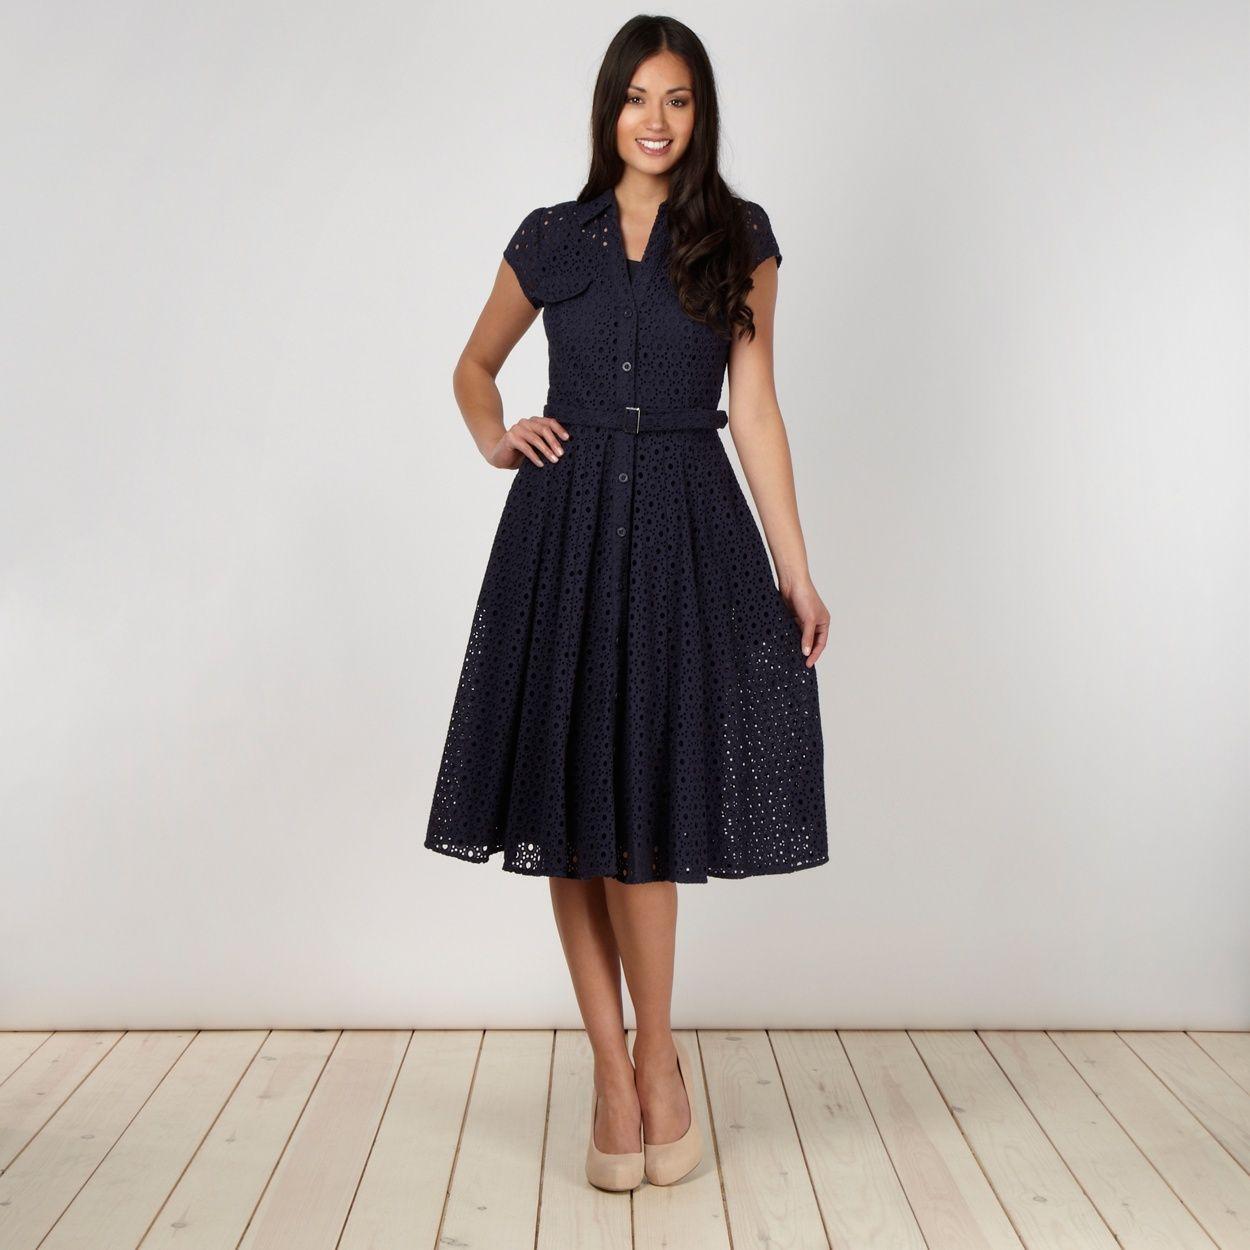 J by Jasper Conran Designer navy broderie shirt dress | Dressing Me